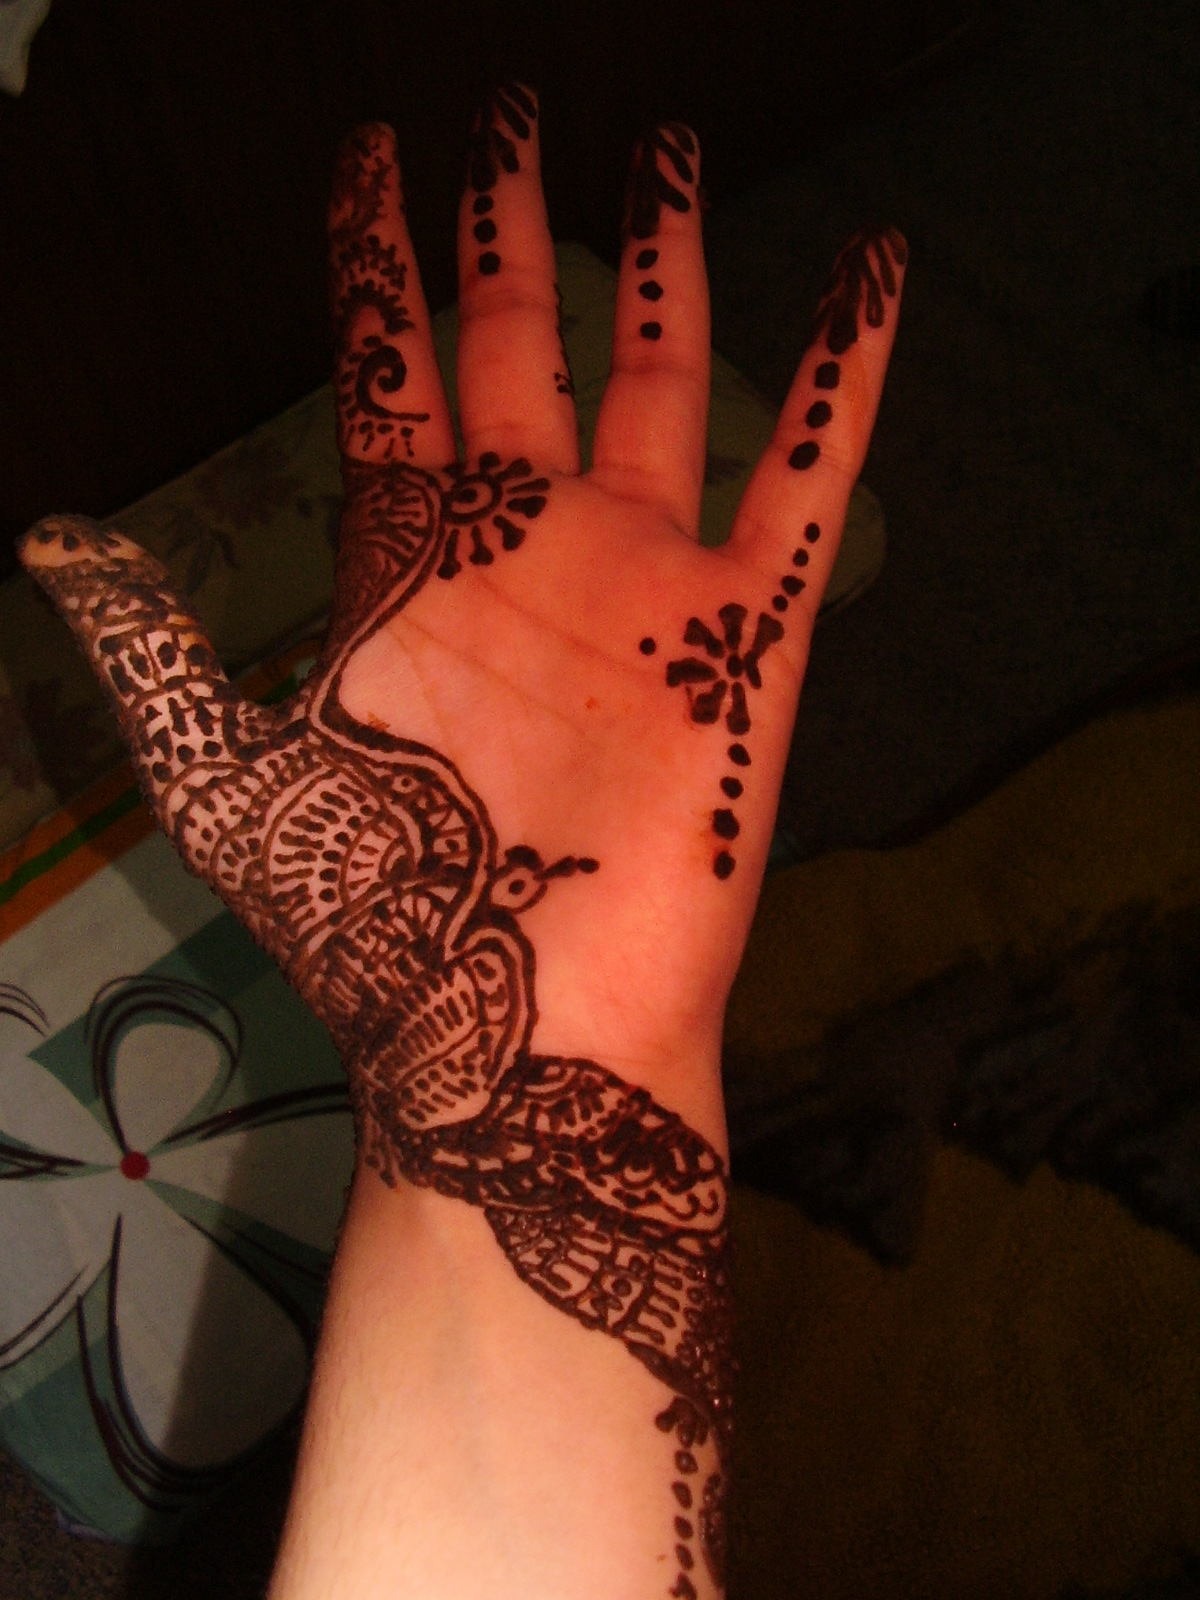 Youth Journalism International Artful Henna Designs Add Beauty To